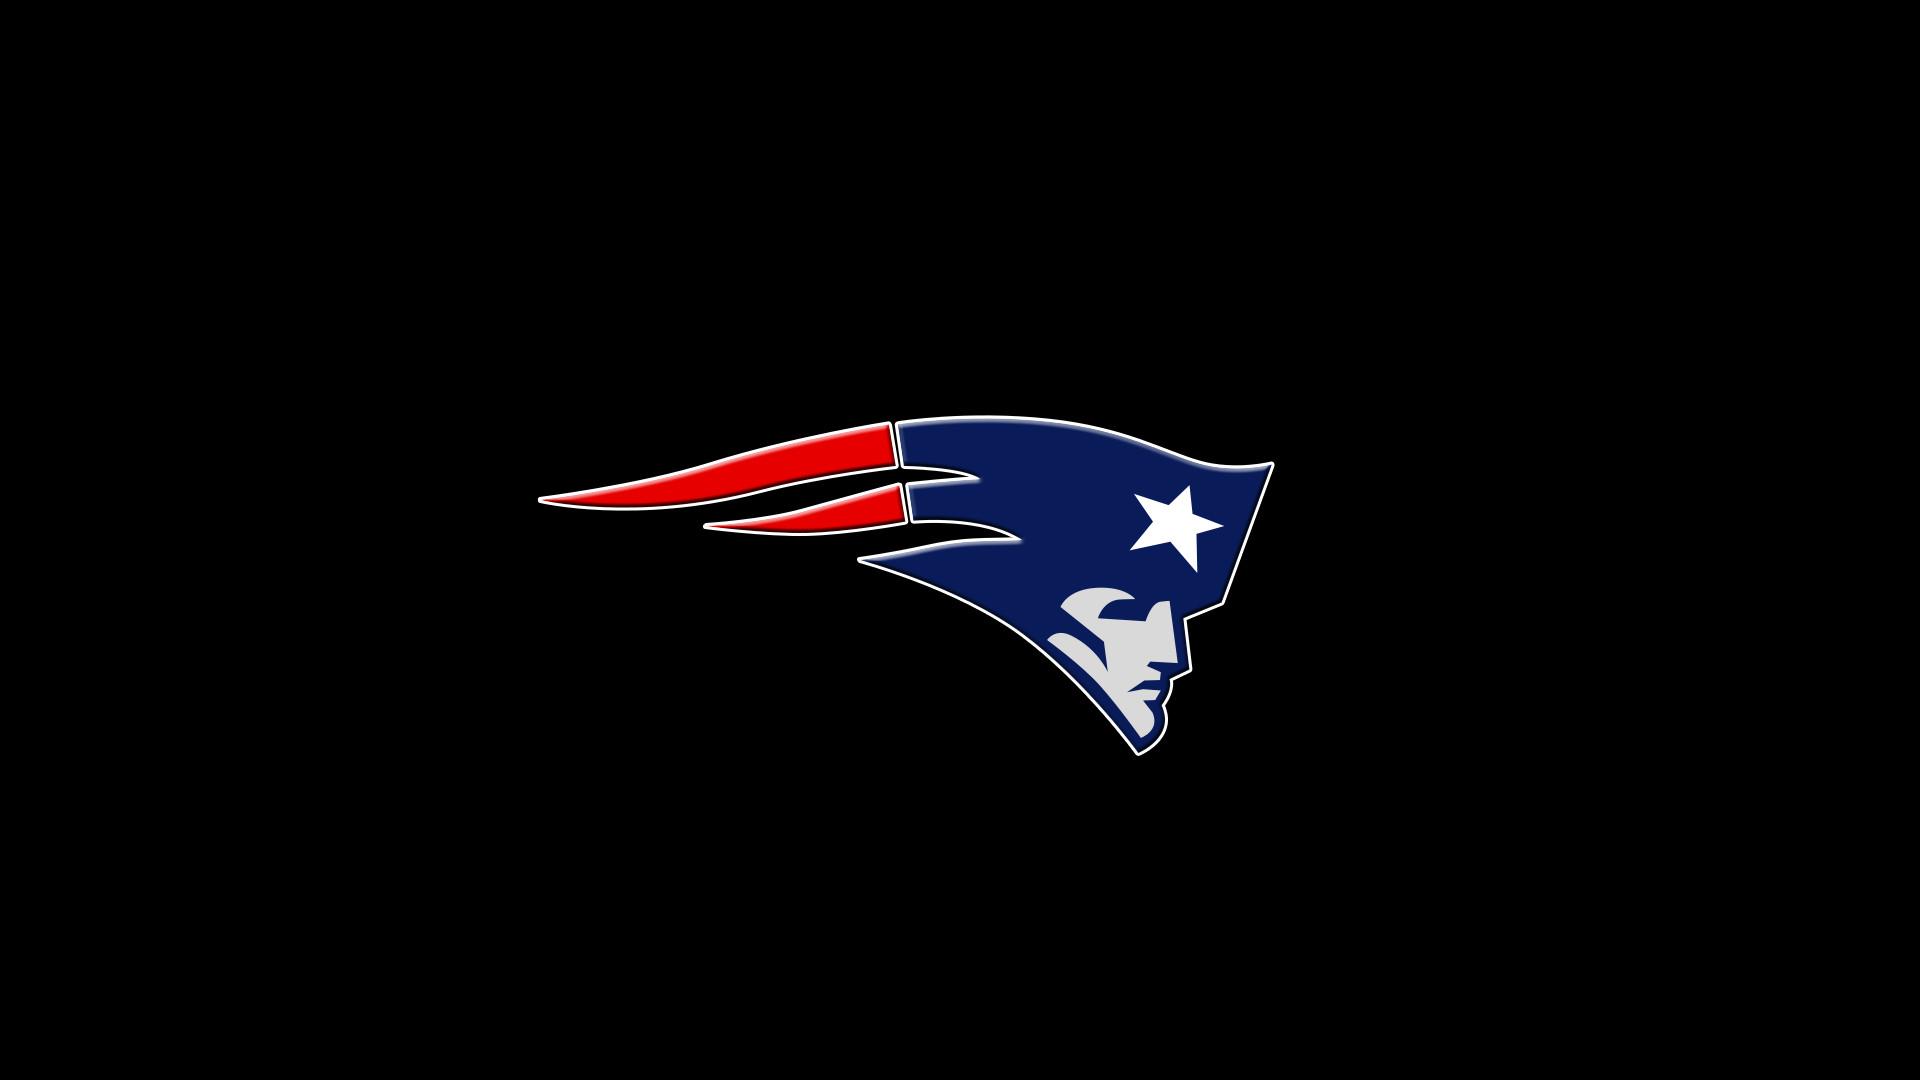 Patriots IPhone 6 Wallpaper (71+ Images